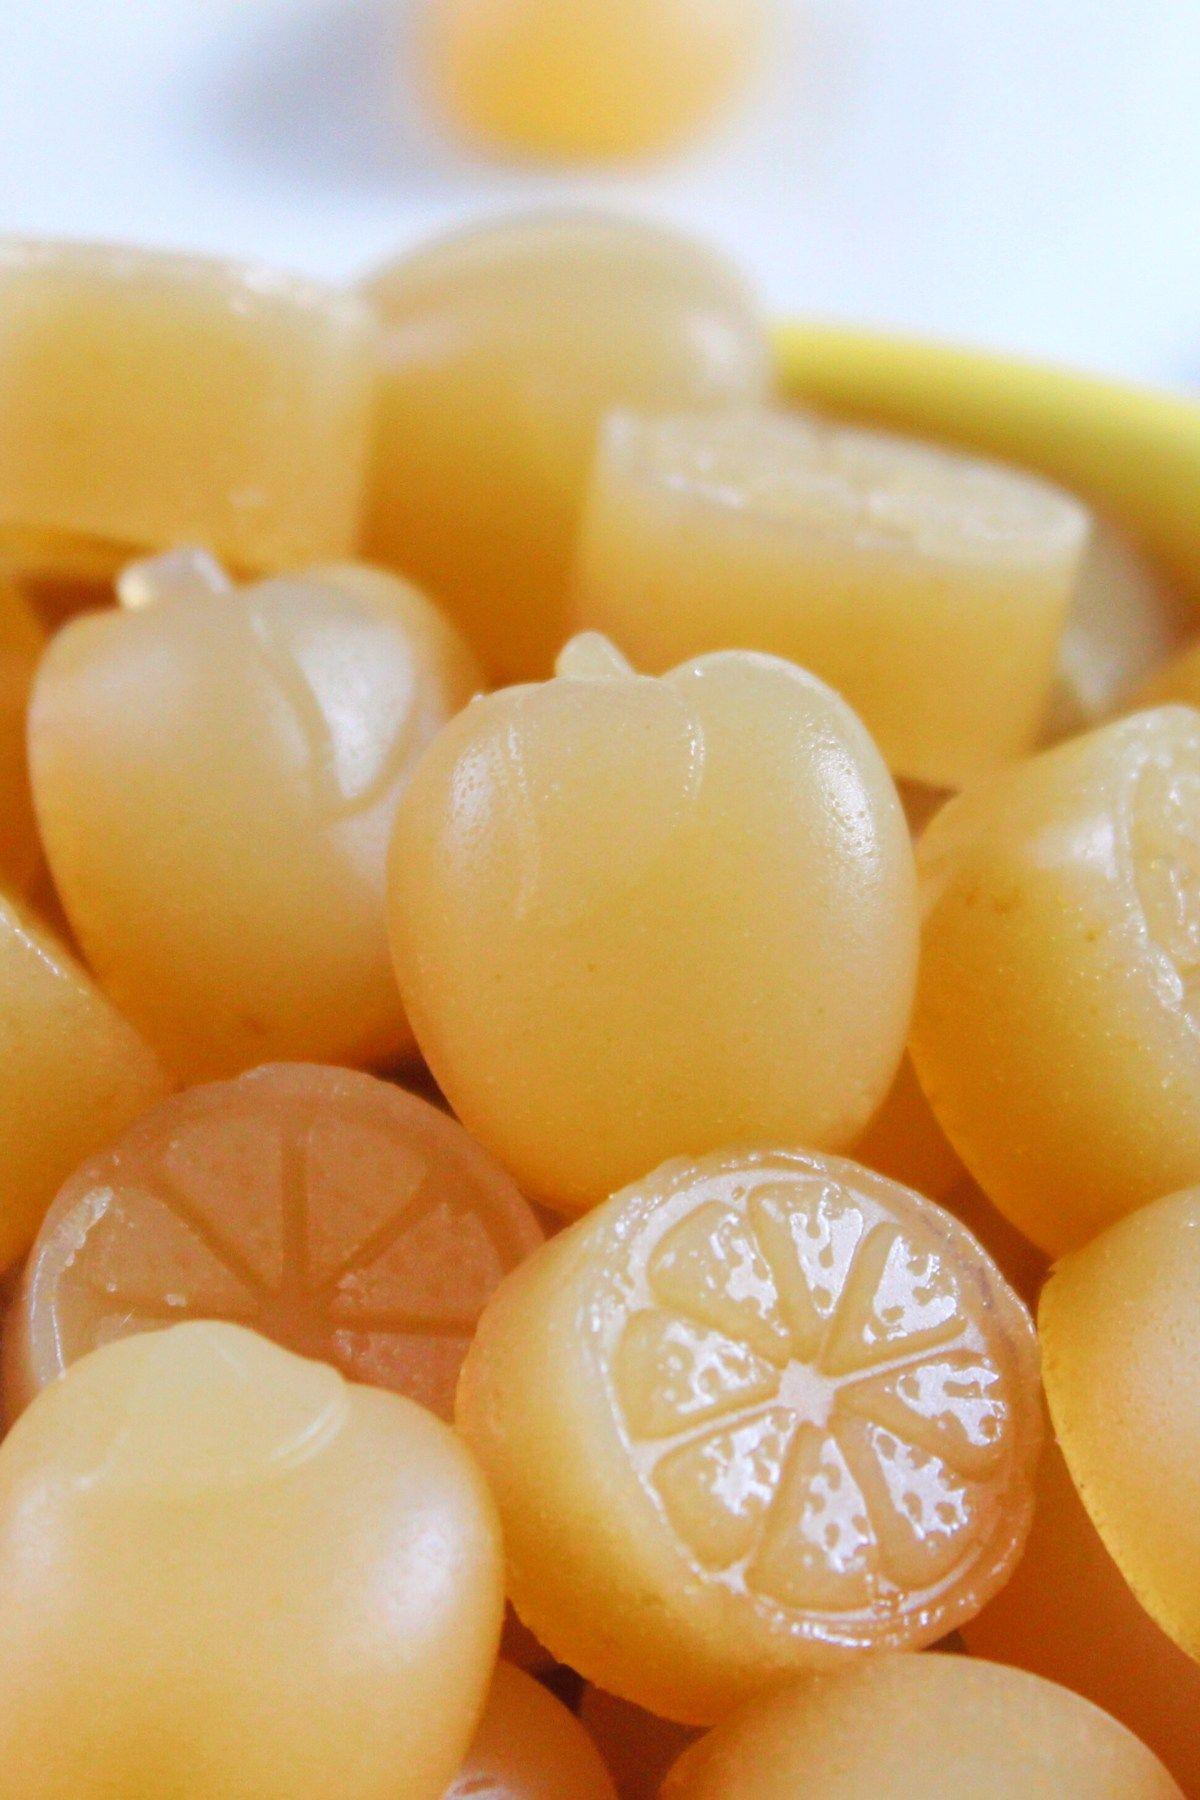 LemonHoney Apple Cider Vinegar Gummies Recipe Honey